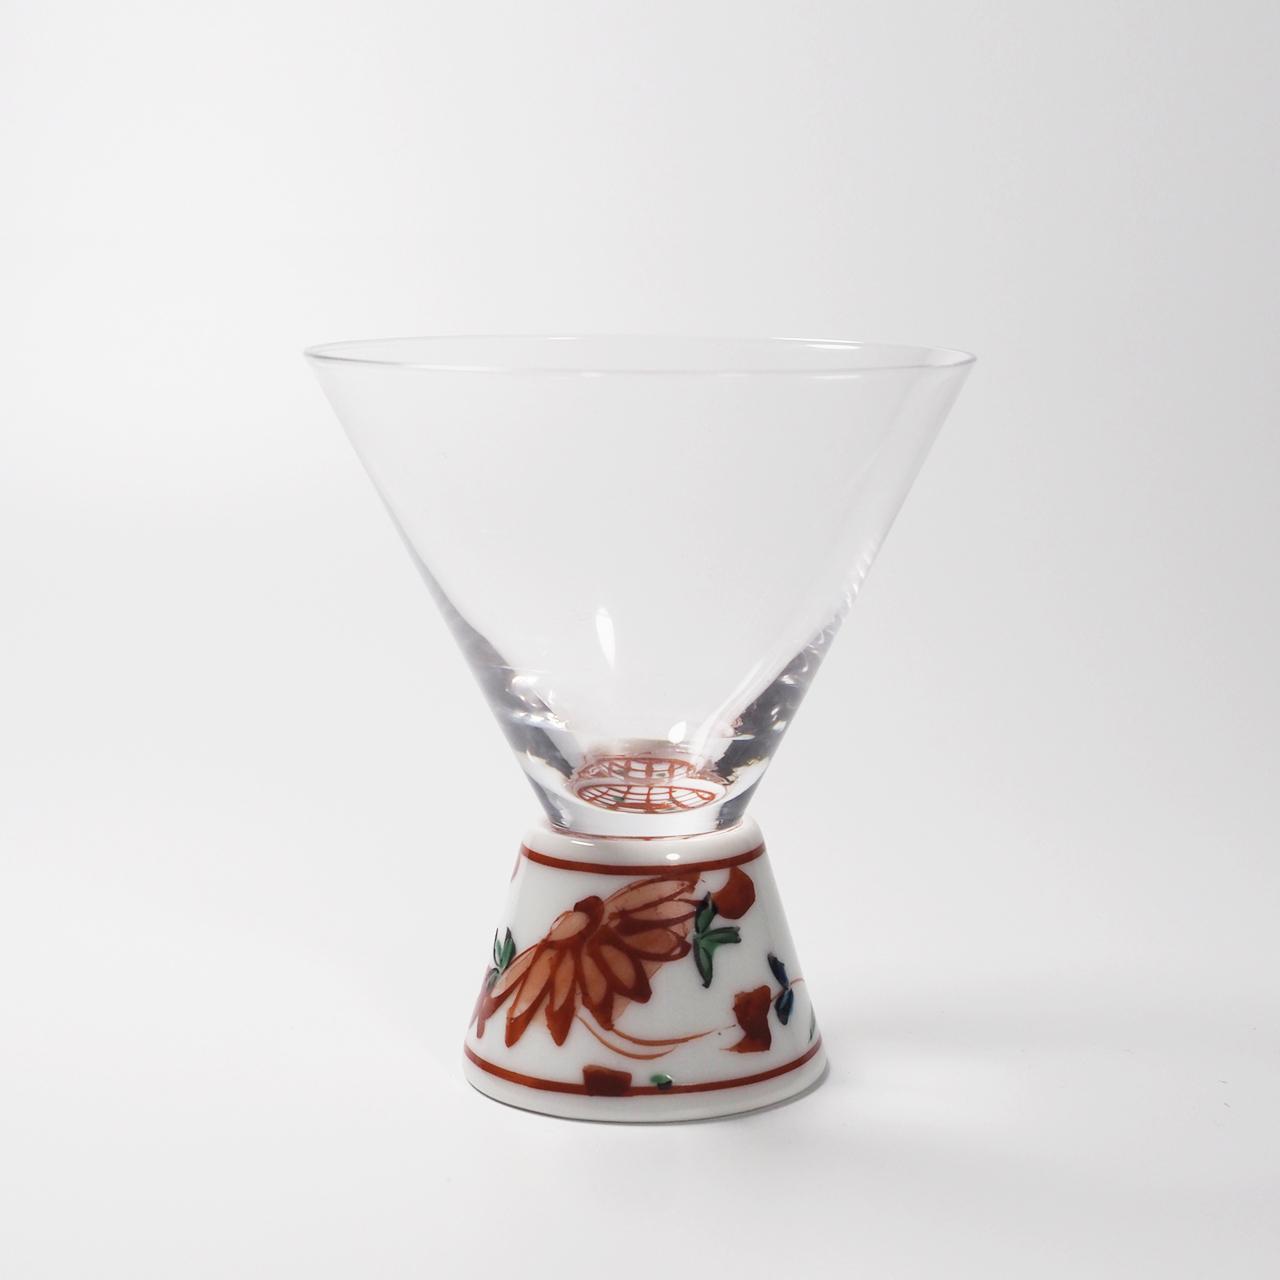 酒グラス(台形) 赤絵錦剣先万歴 20-002-A